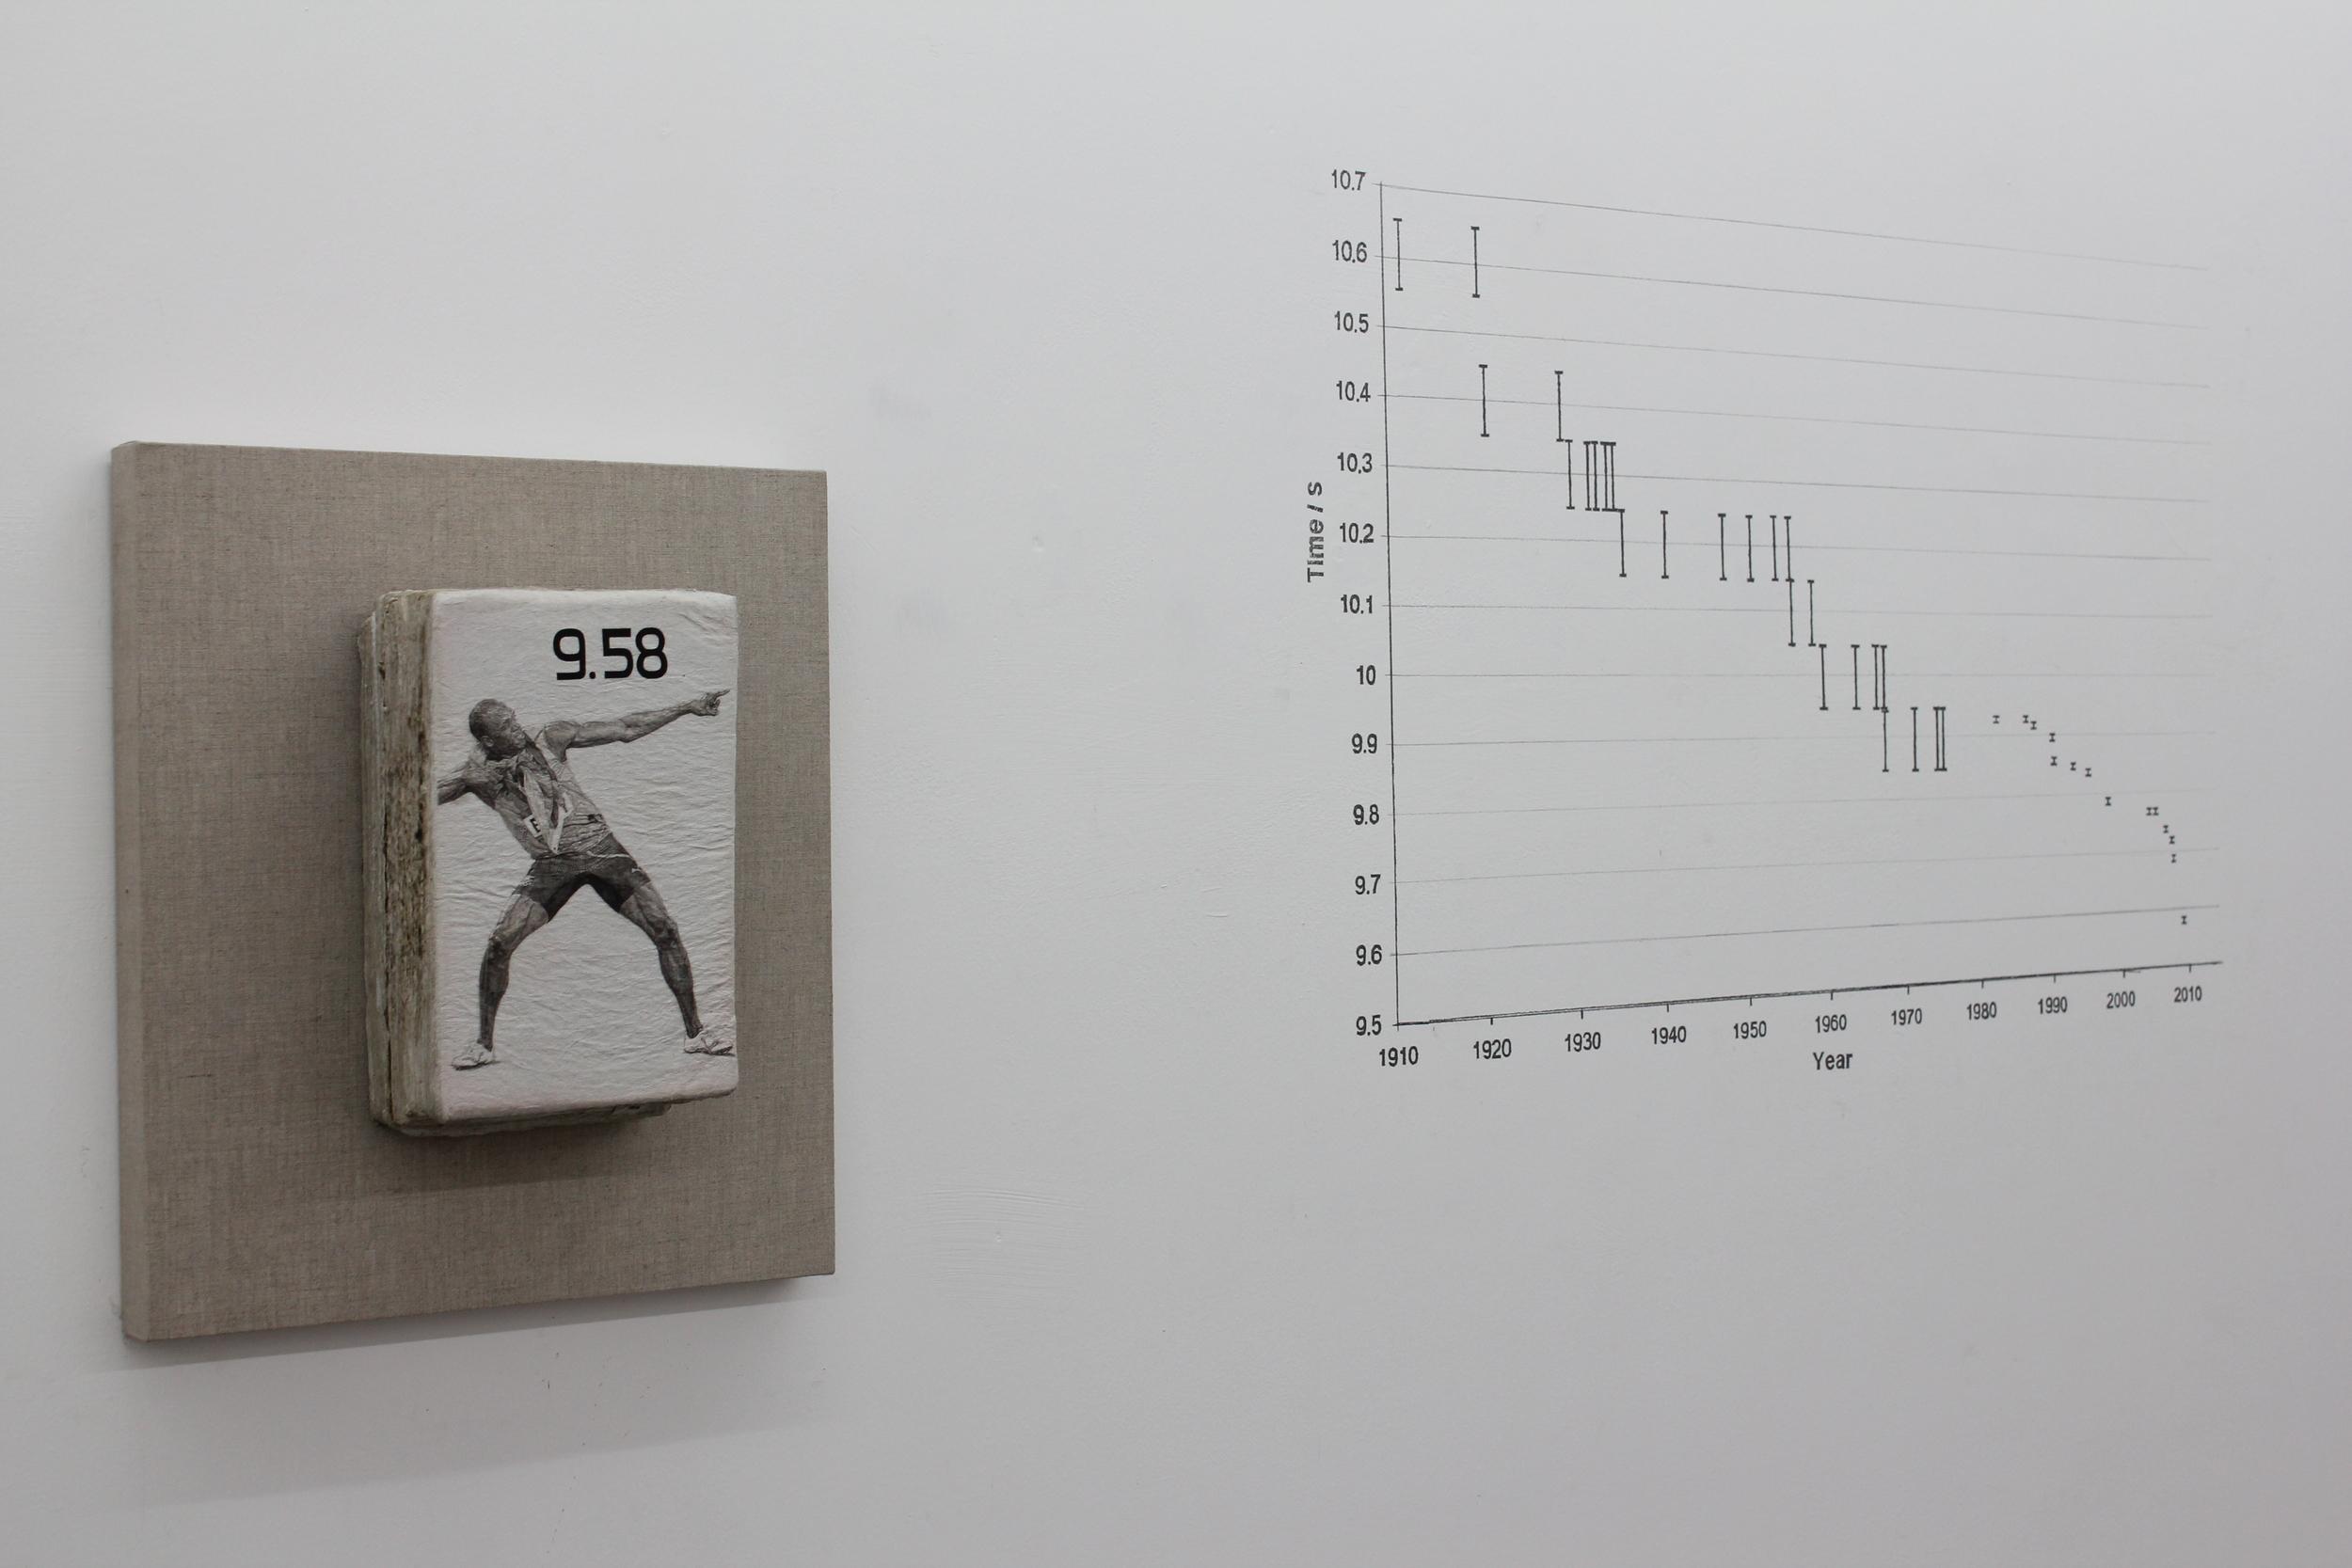 Liu Ren 刘任, S/9.58, 2013, Oil on straw paper 草纸油画, 26 x 17 x 13 cm